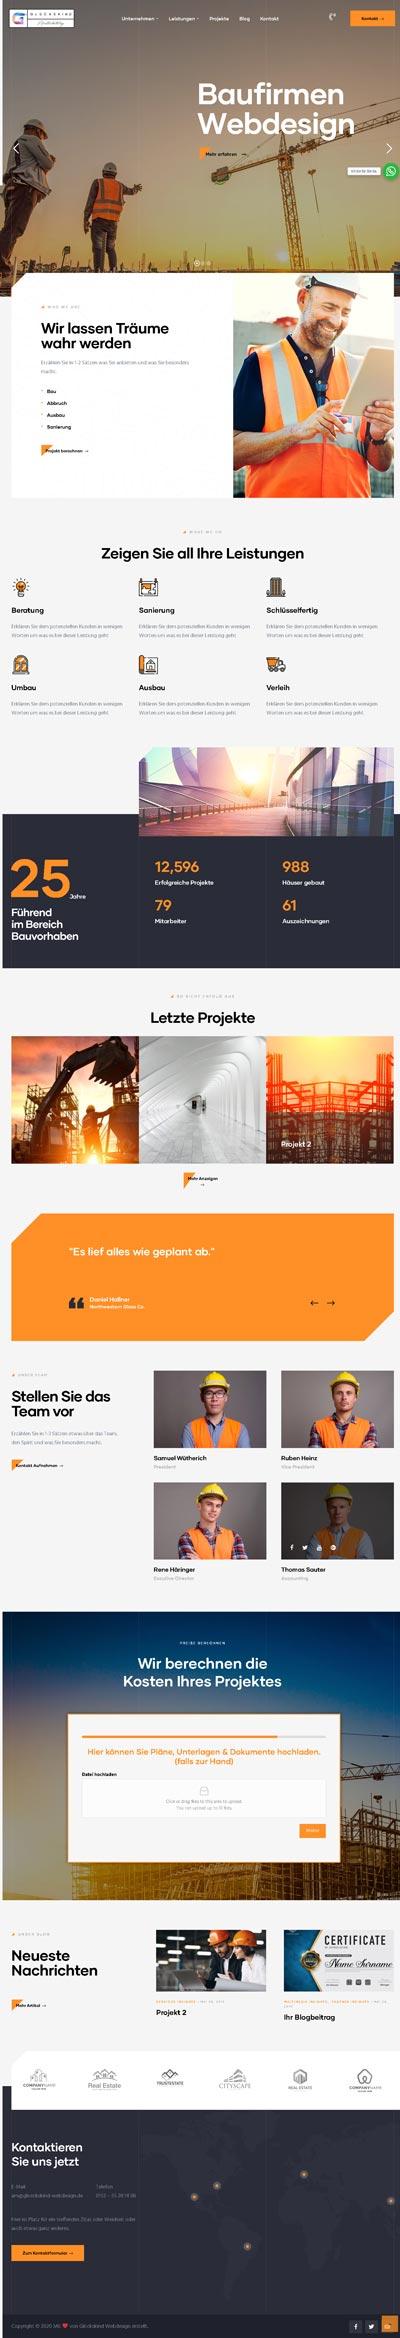 Bau Strabak - Glückskind Webdesign Musterkatalog